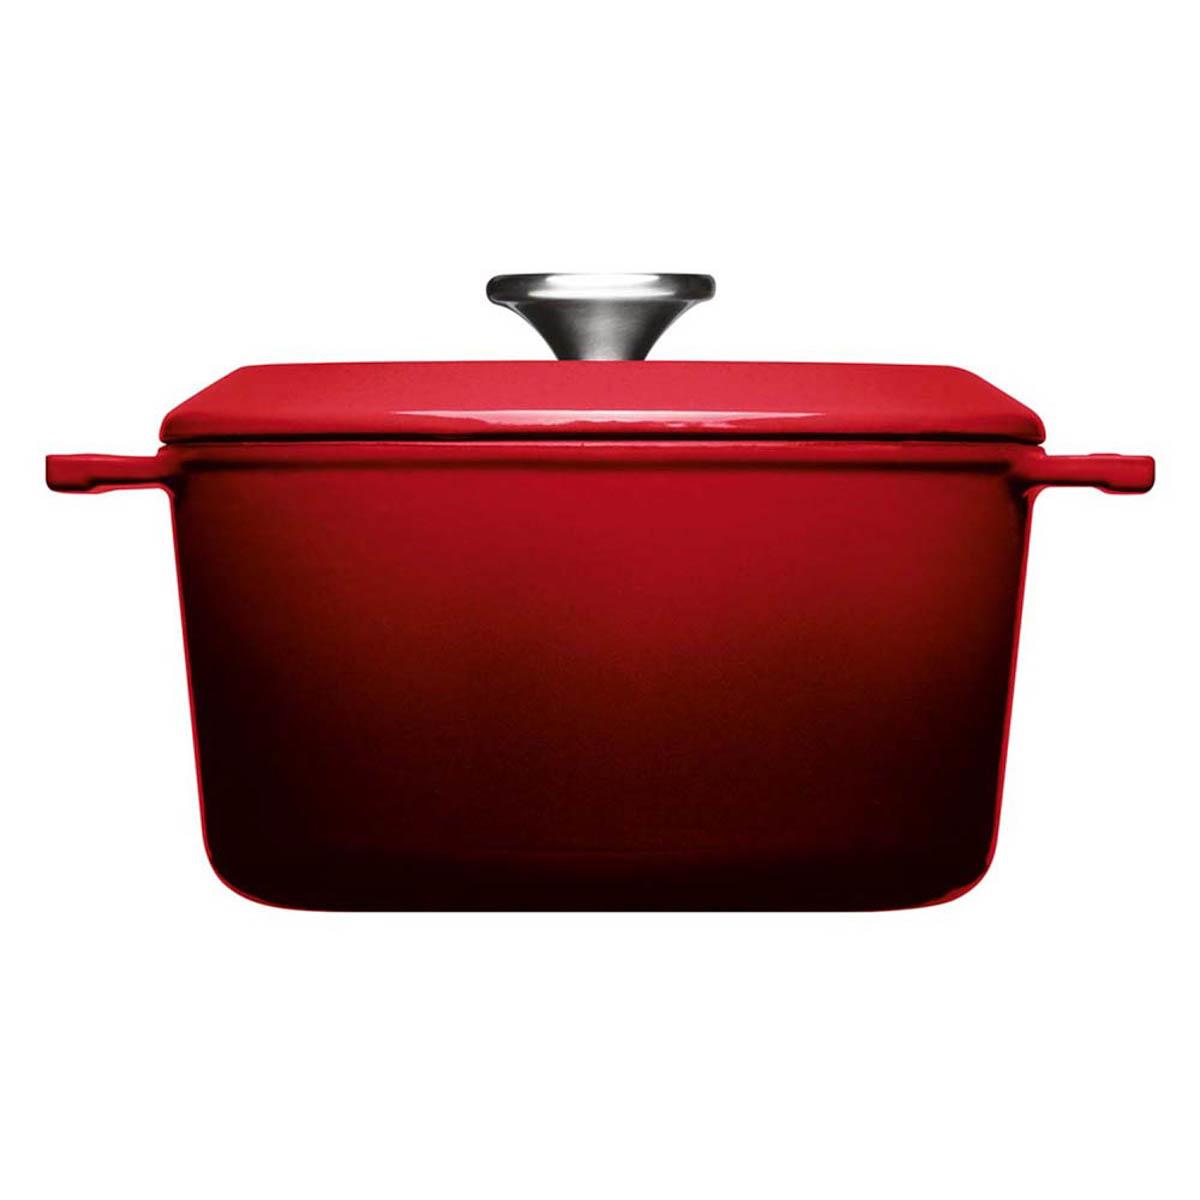 Woll Iron Gusstopf mit Deckel 20 cm Rot